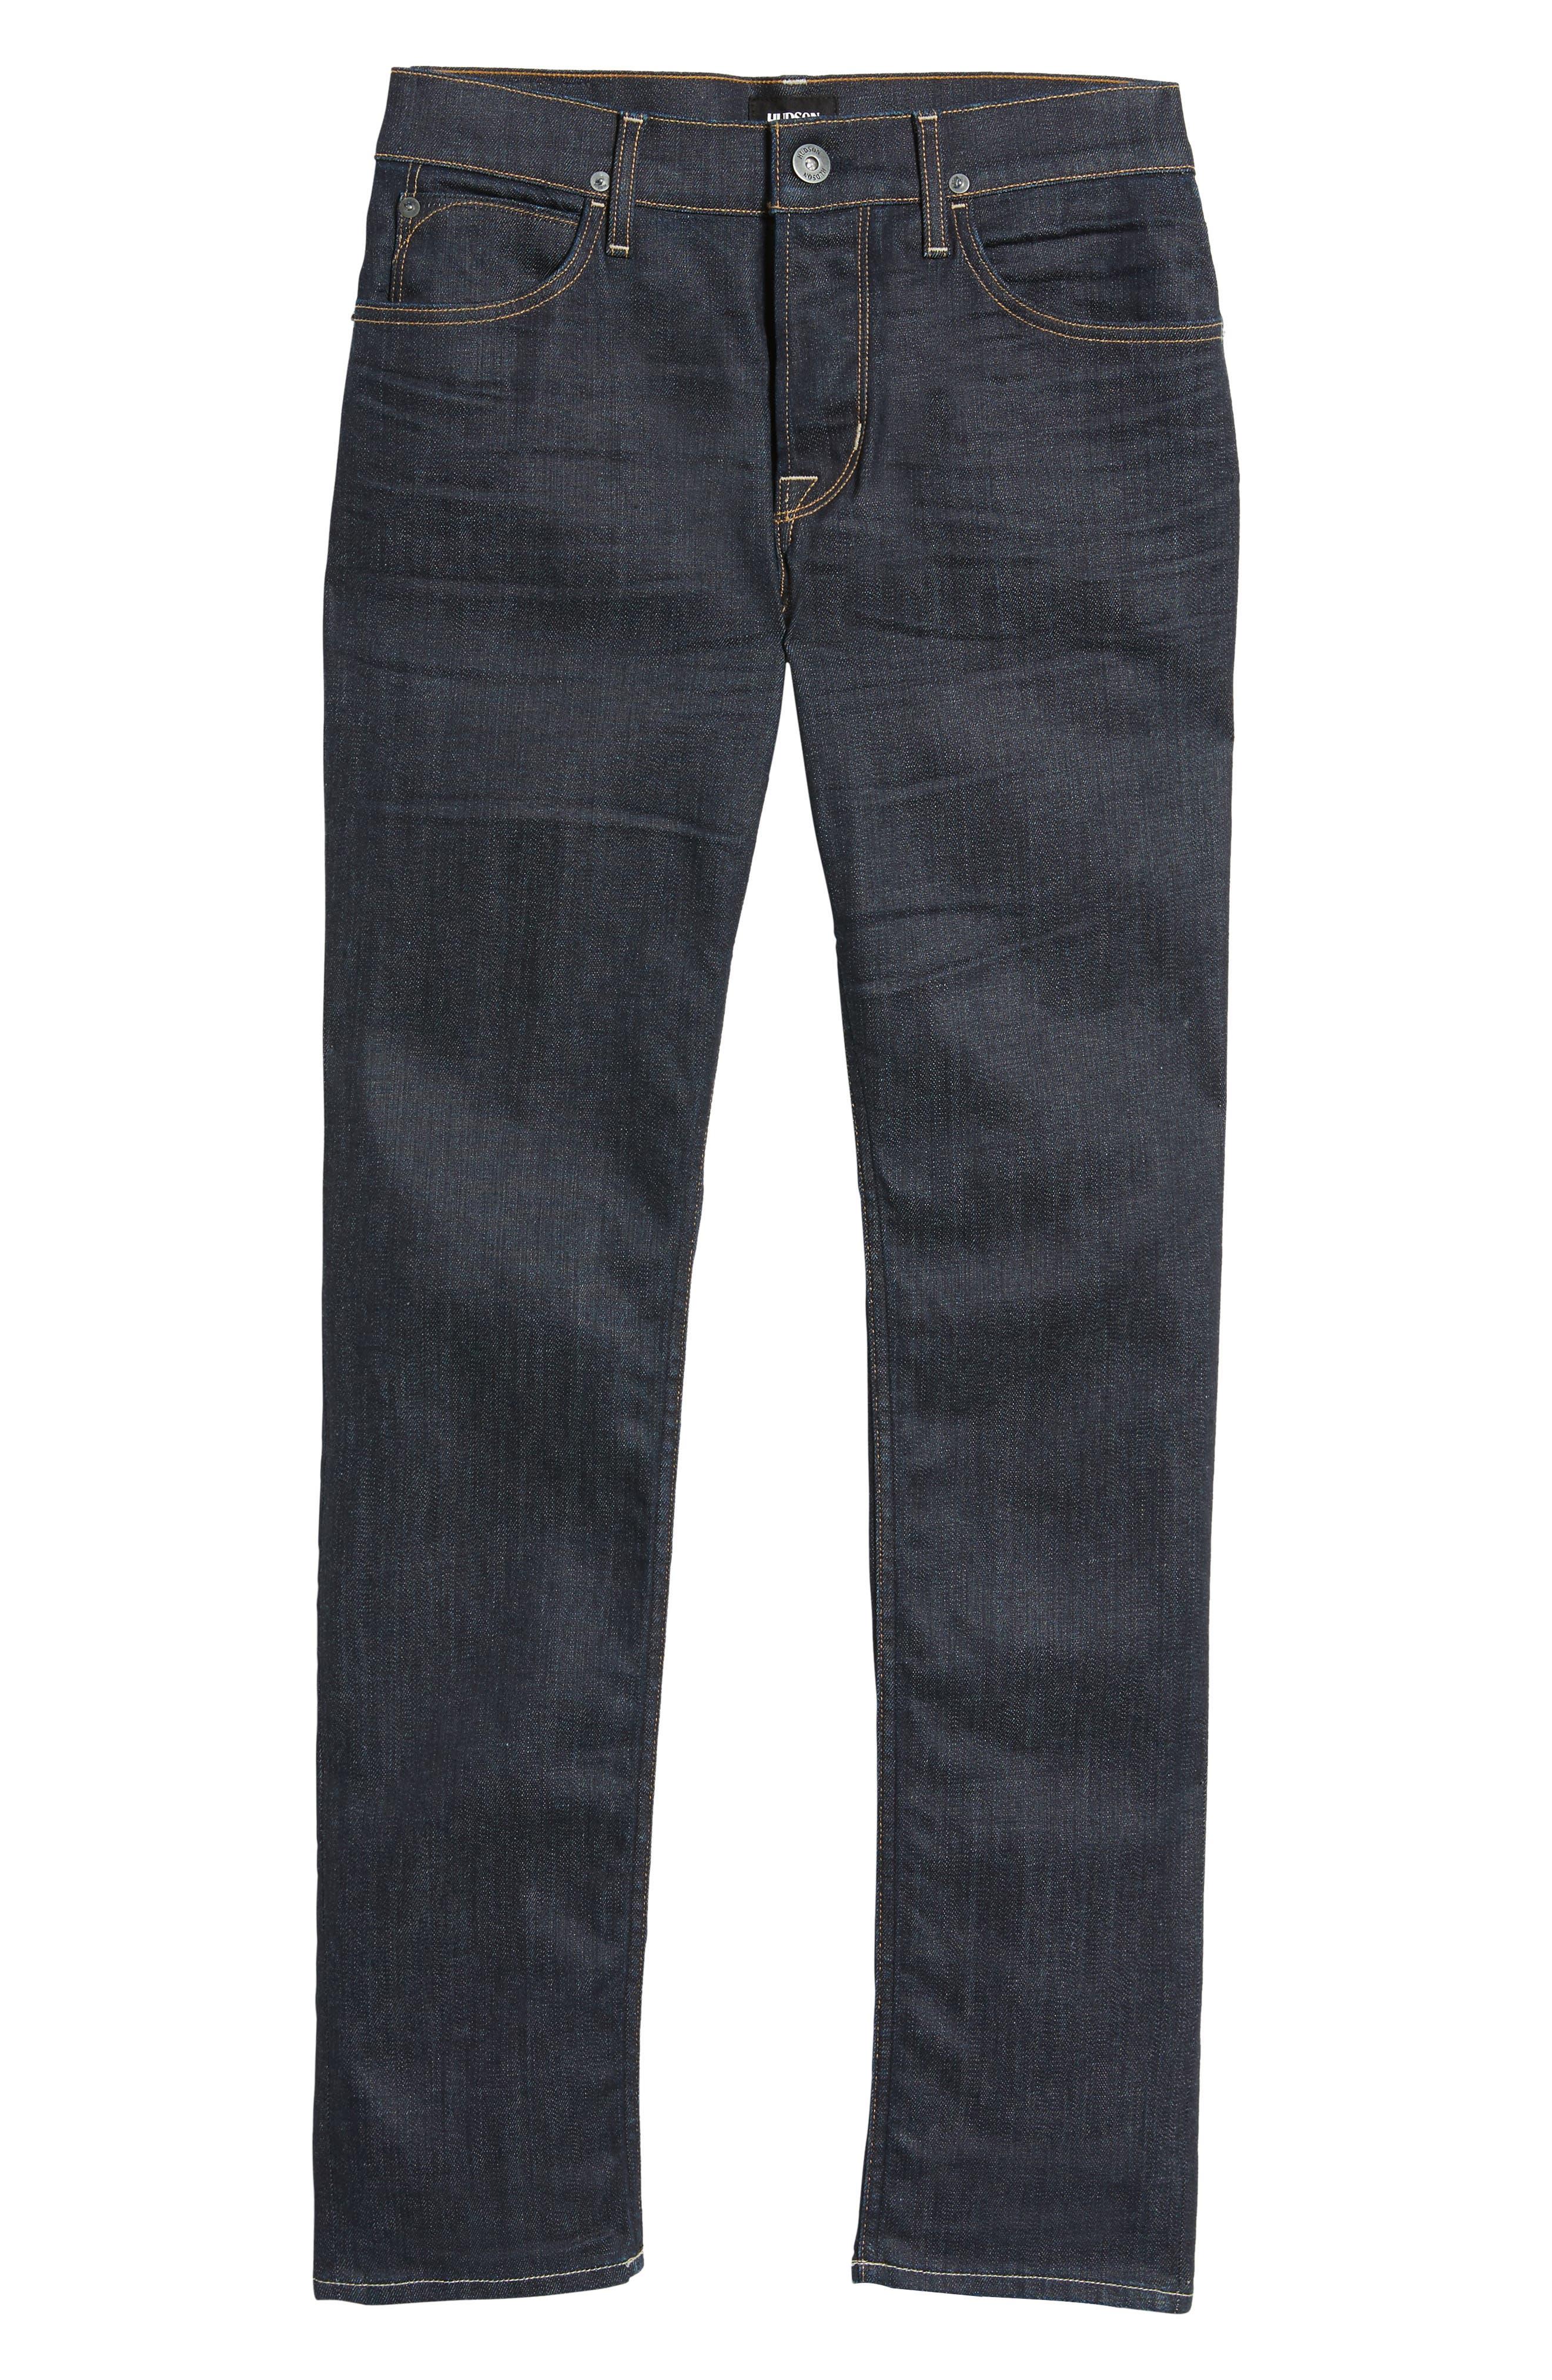 Hudson Axl Skinny Fit Jeans,                             Alternate thumbnail 6, color,                             Fiend